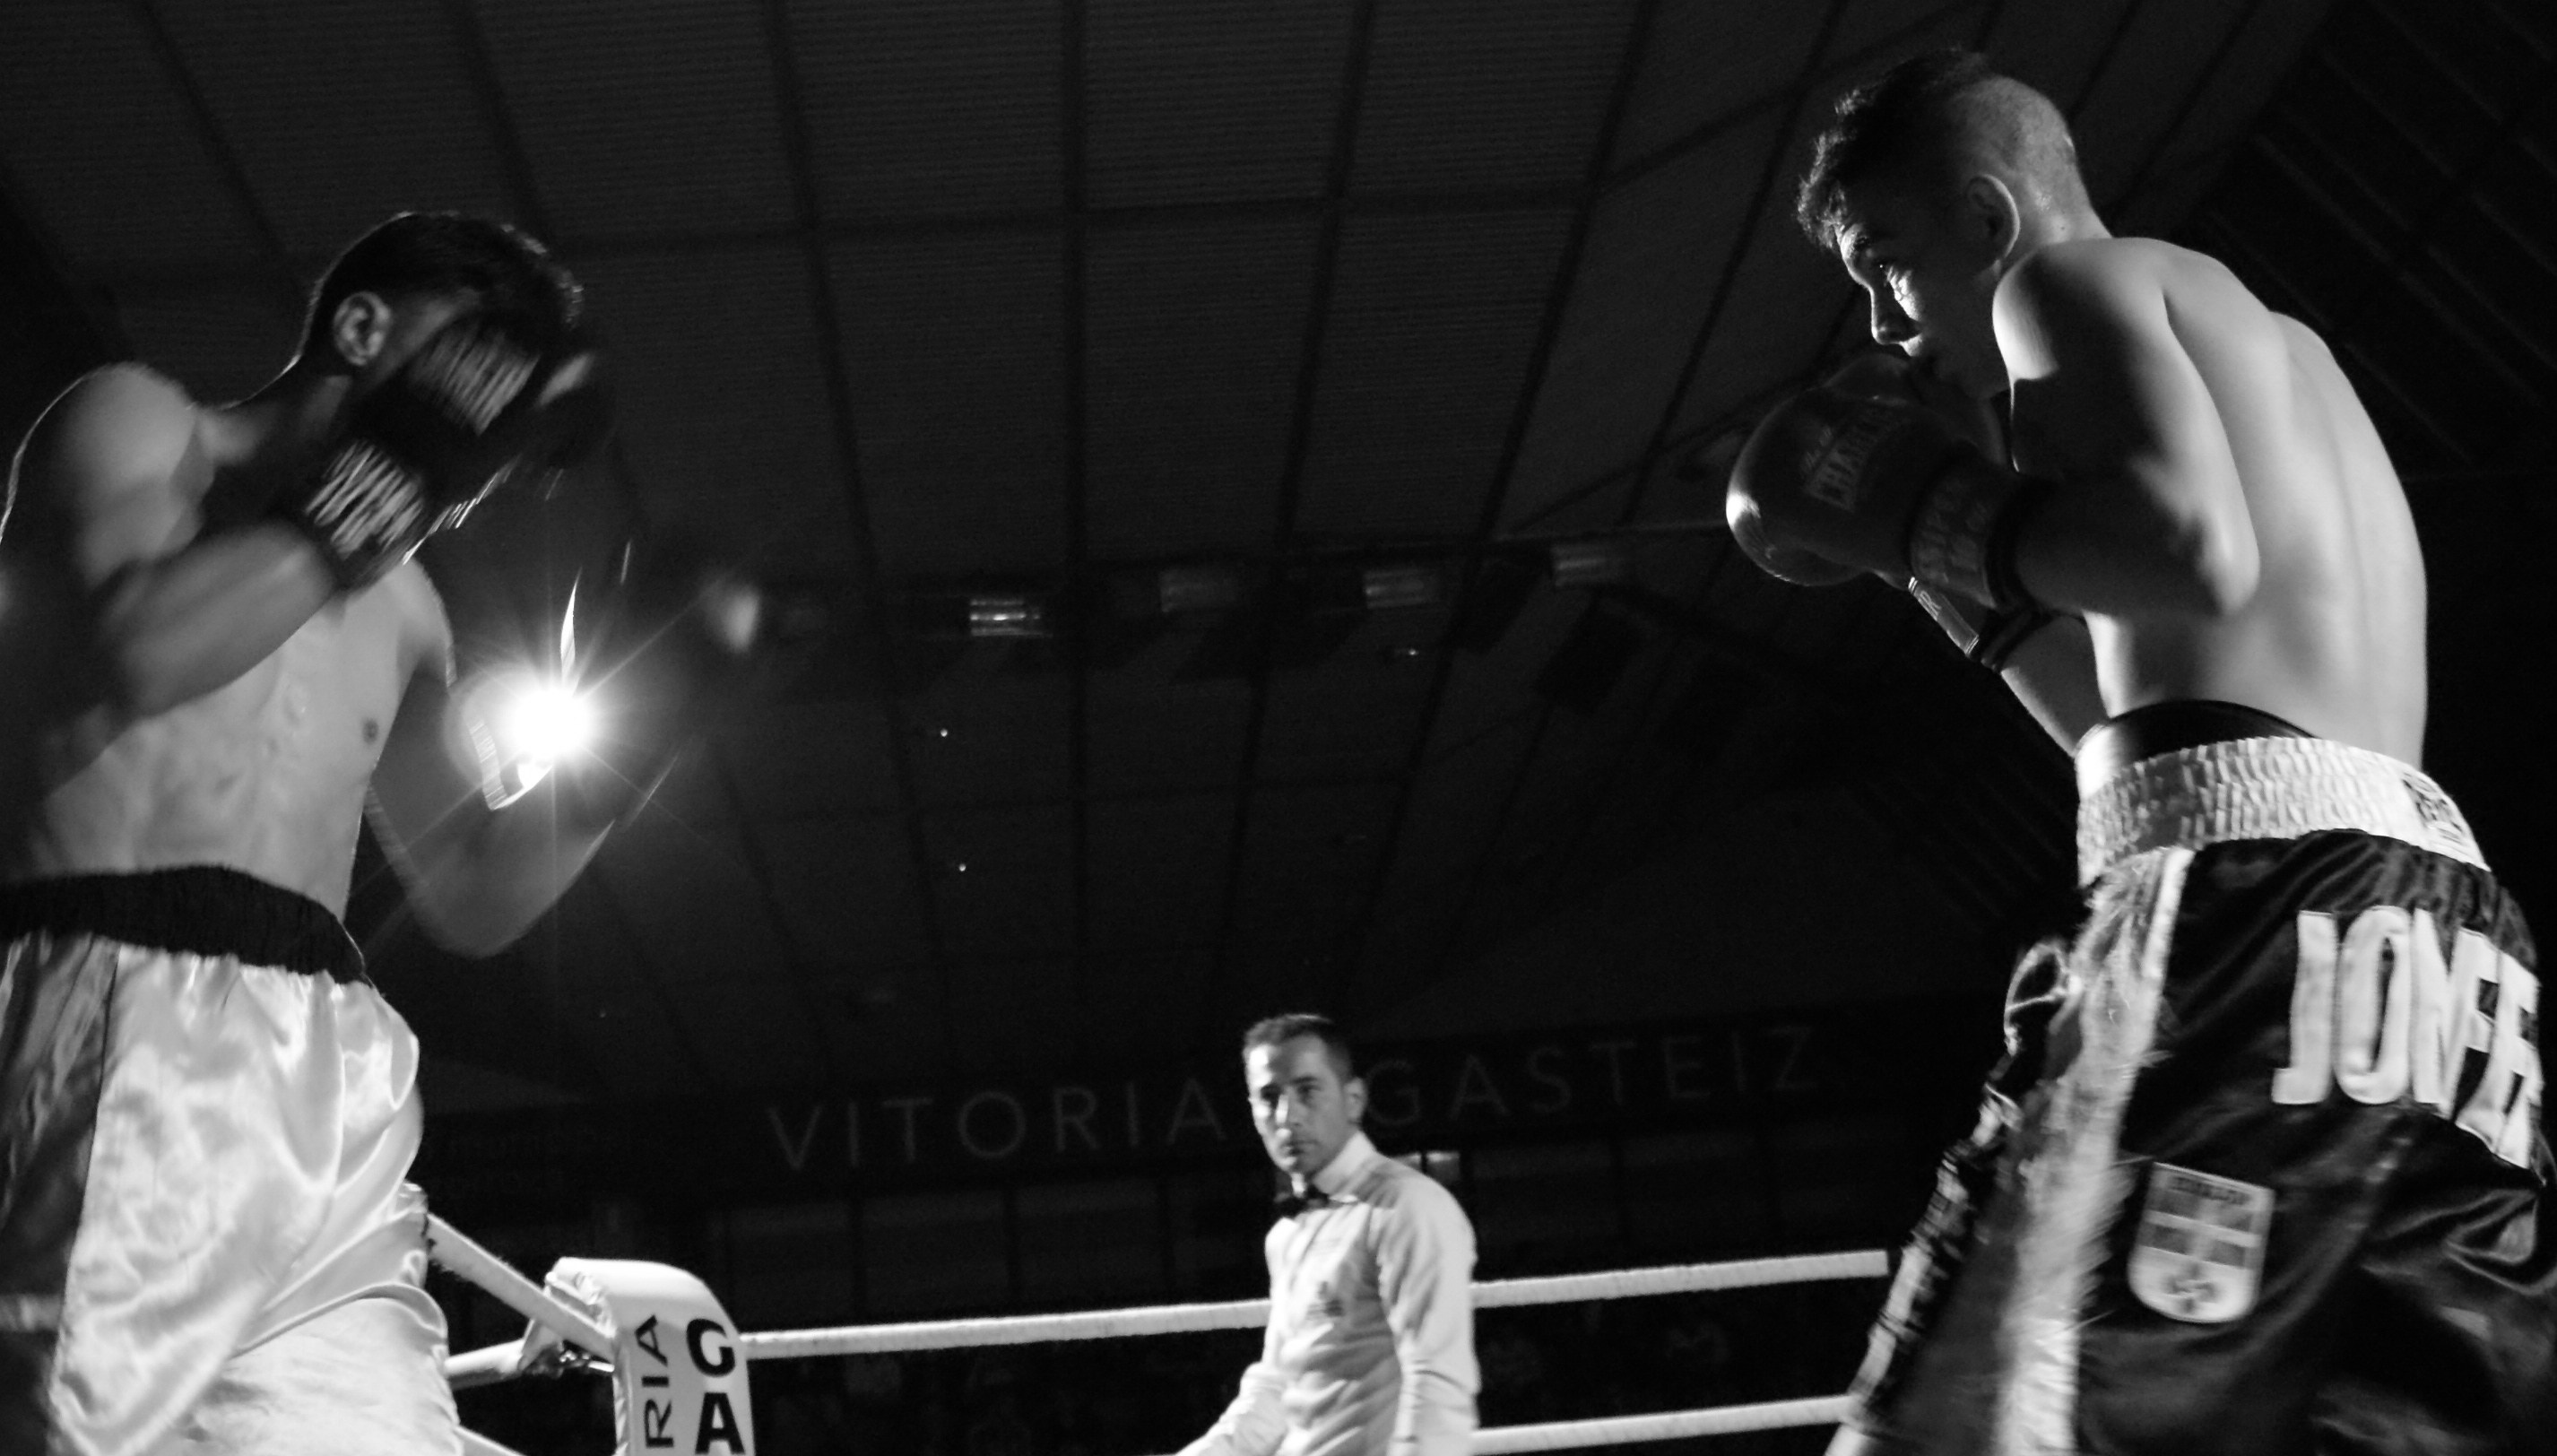 Jon Fernández y Zacarias, boxeo en Vitoria-Gasteiz